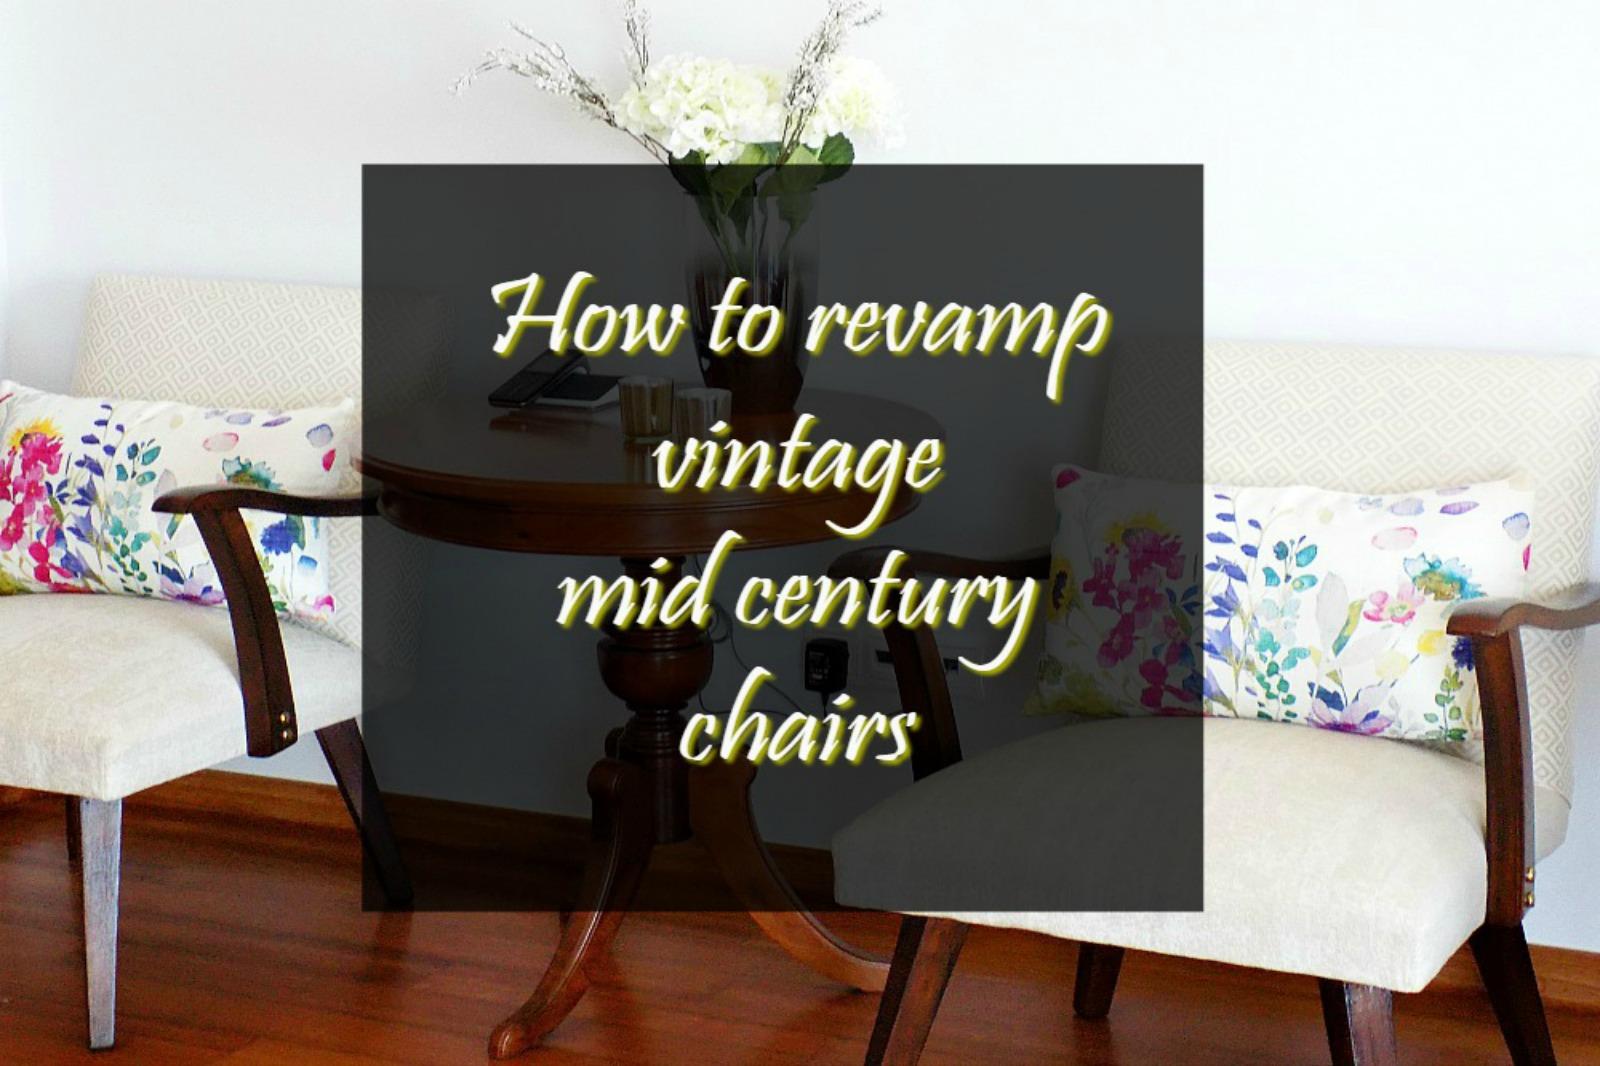 Mid-century πολυθρόνες αλλάζουν εμφάνιση   How to revamp mid-century chairs